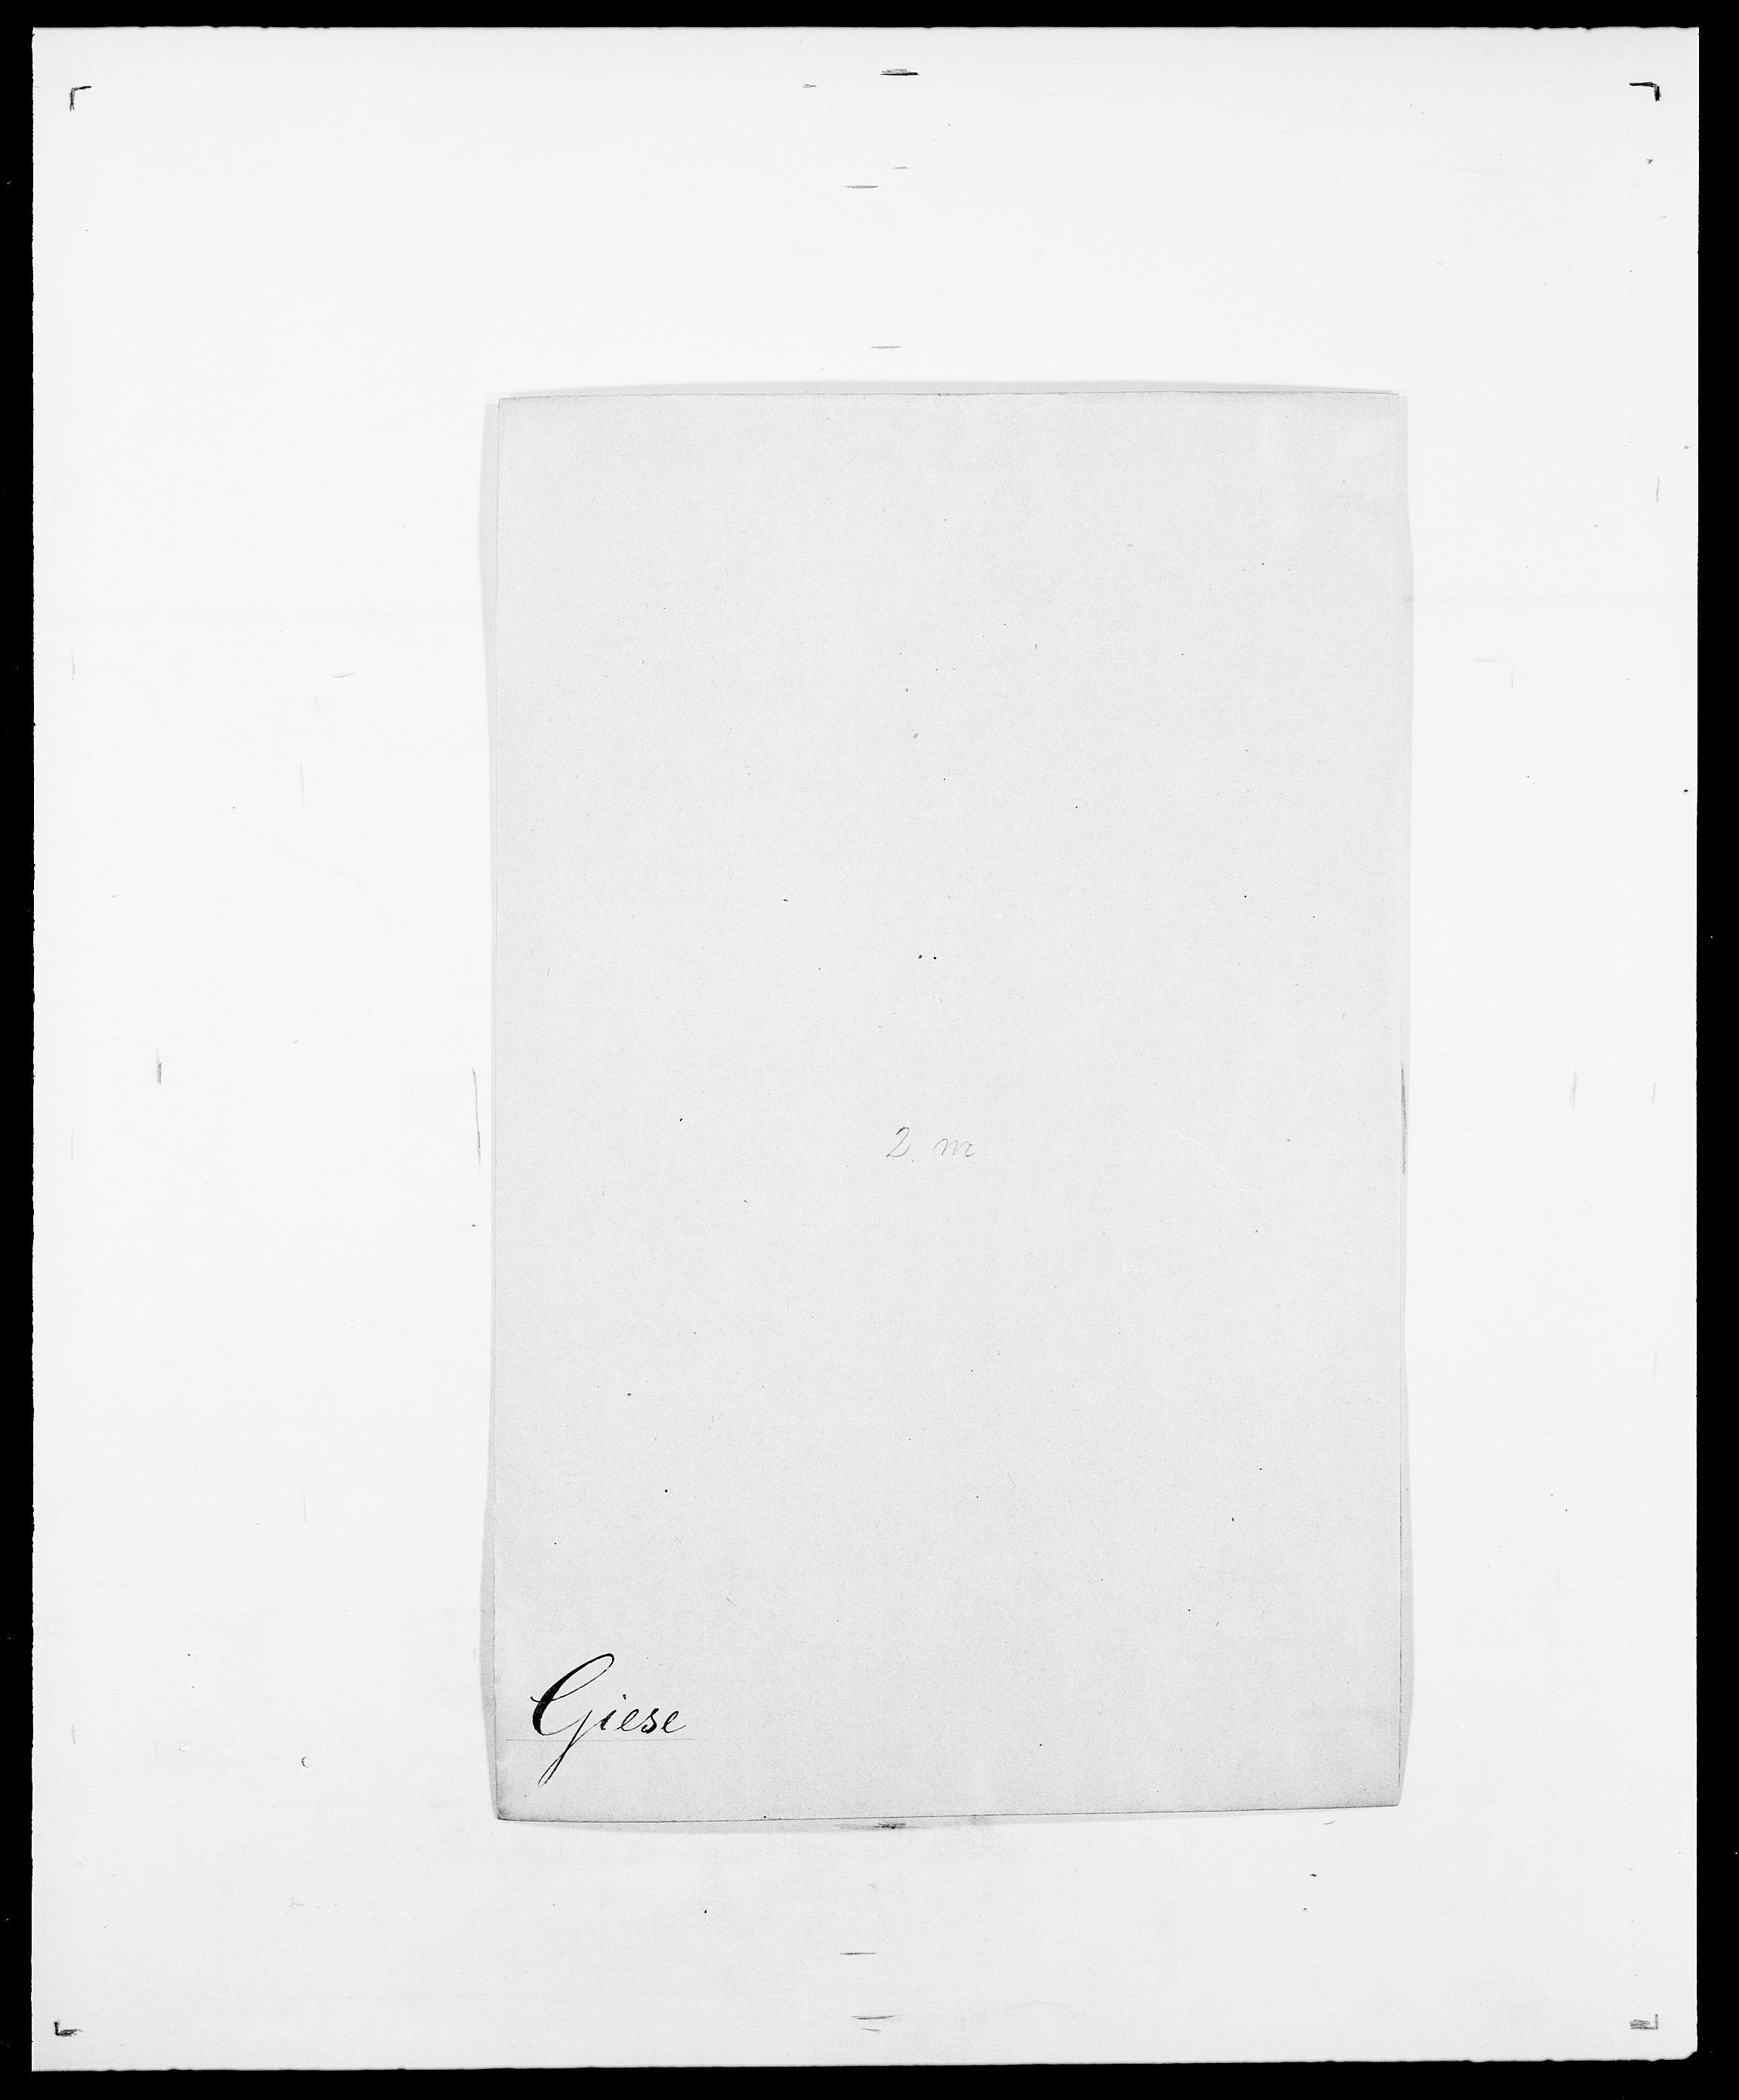 SAO, Delgobe, Charles Antoine - samling, D/Da/L0014: Giebdhausen - Grip, s. 18